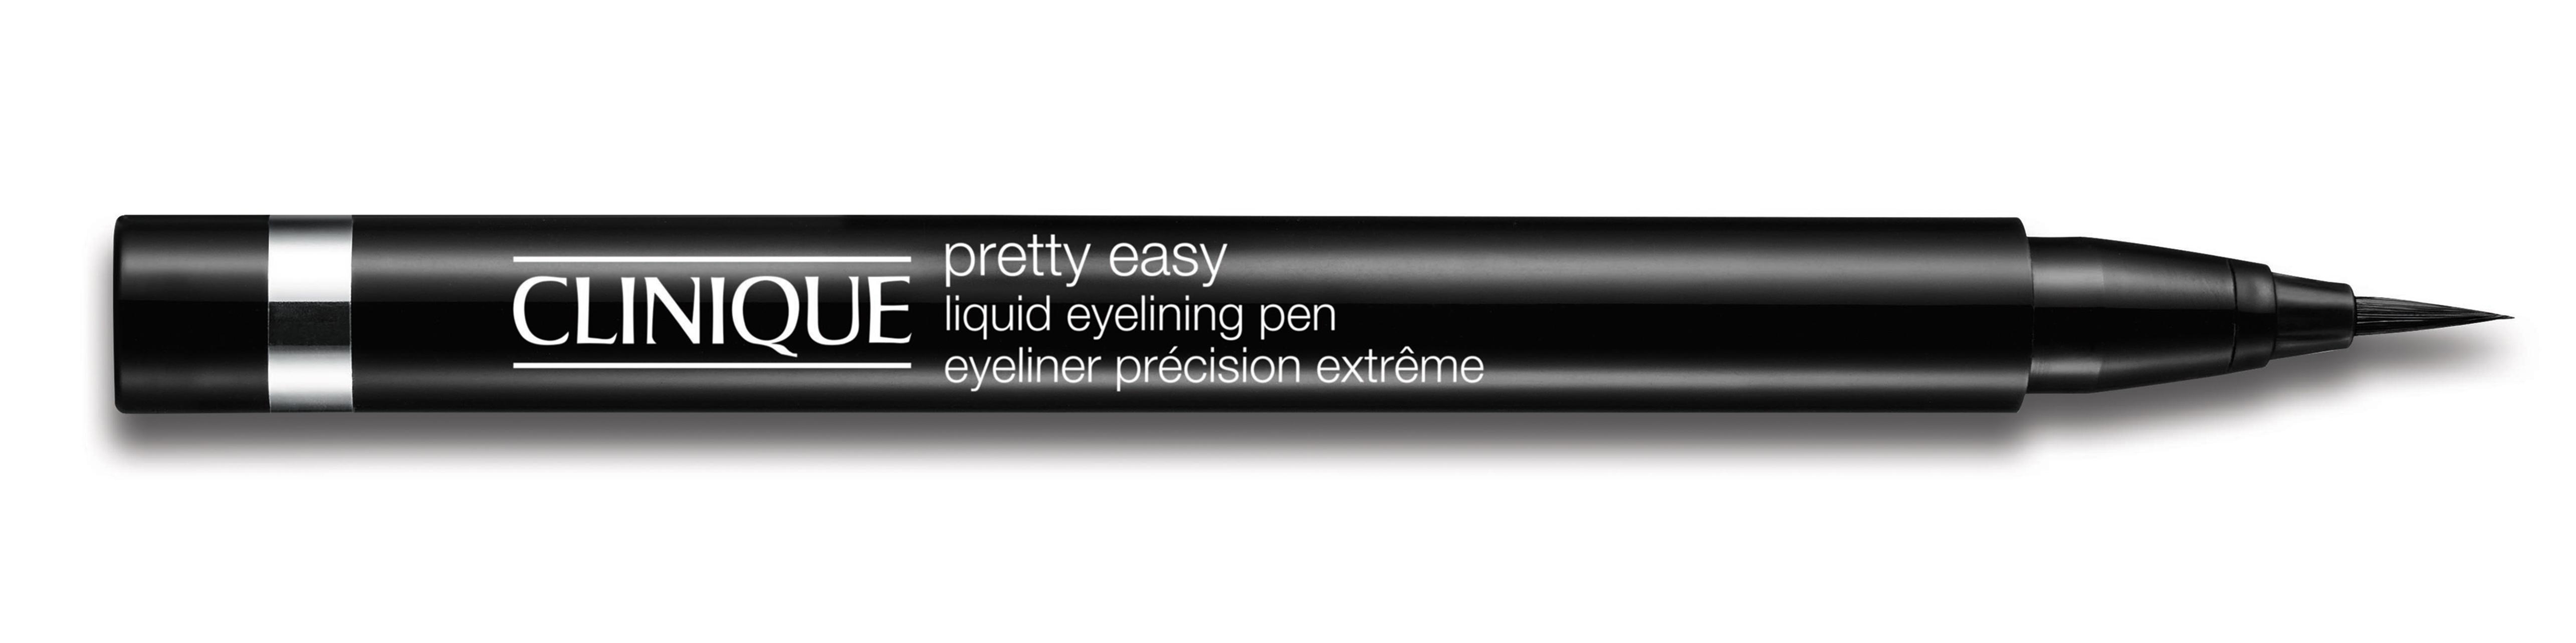 Pretty-Easy-Liquid-Eyelining-Pen-No-Cap1